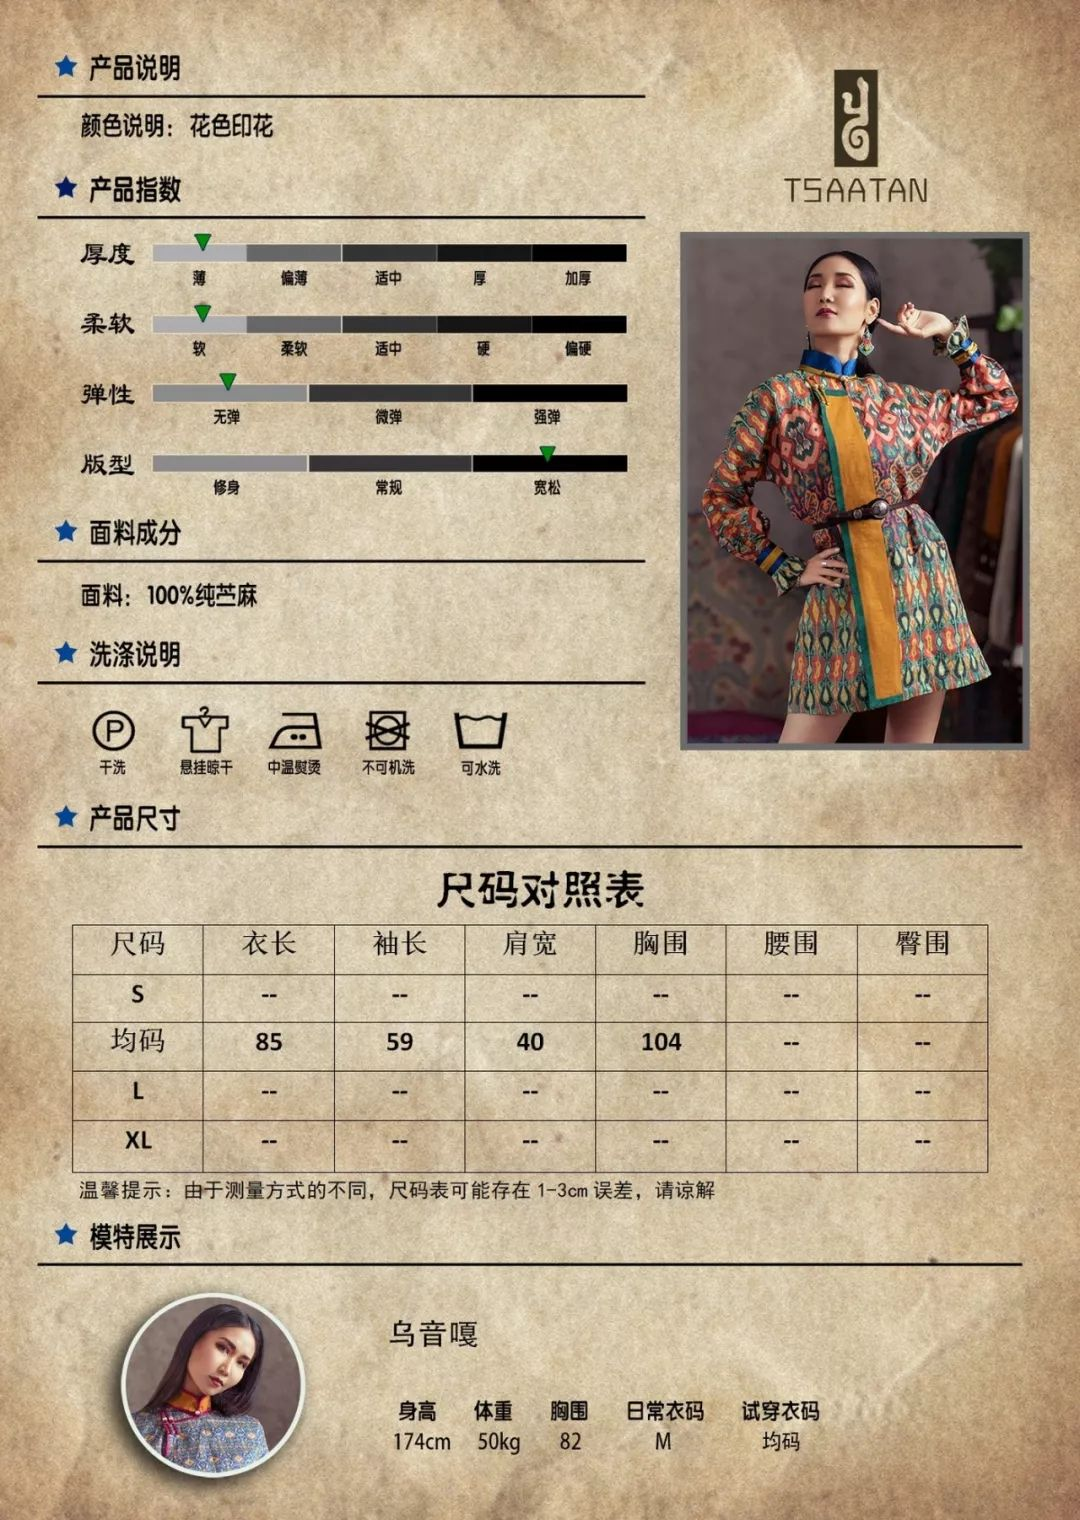 TSAATAN蒙古时装秋冬系列,来自驯鹿人的独特魅力! 第36张